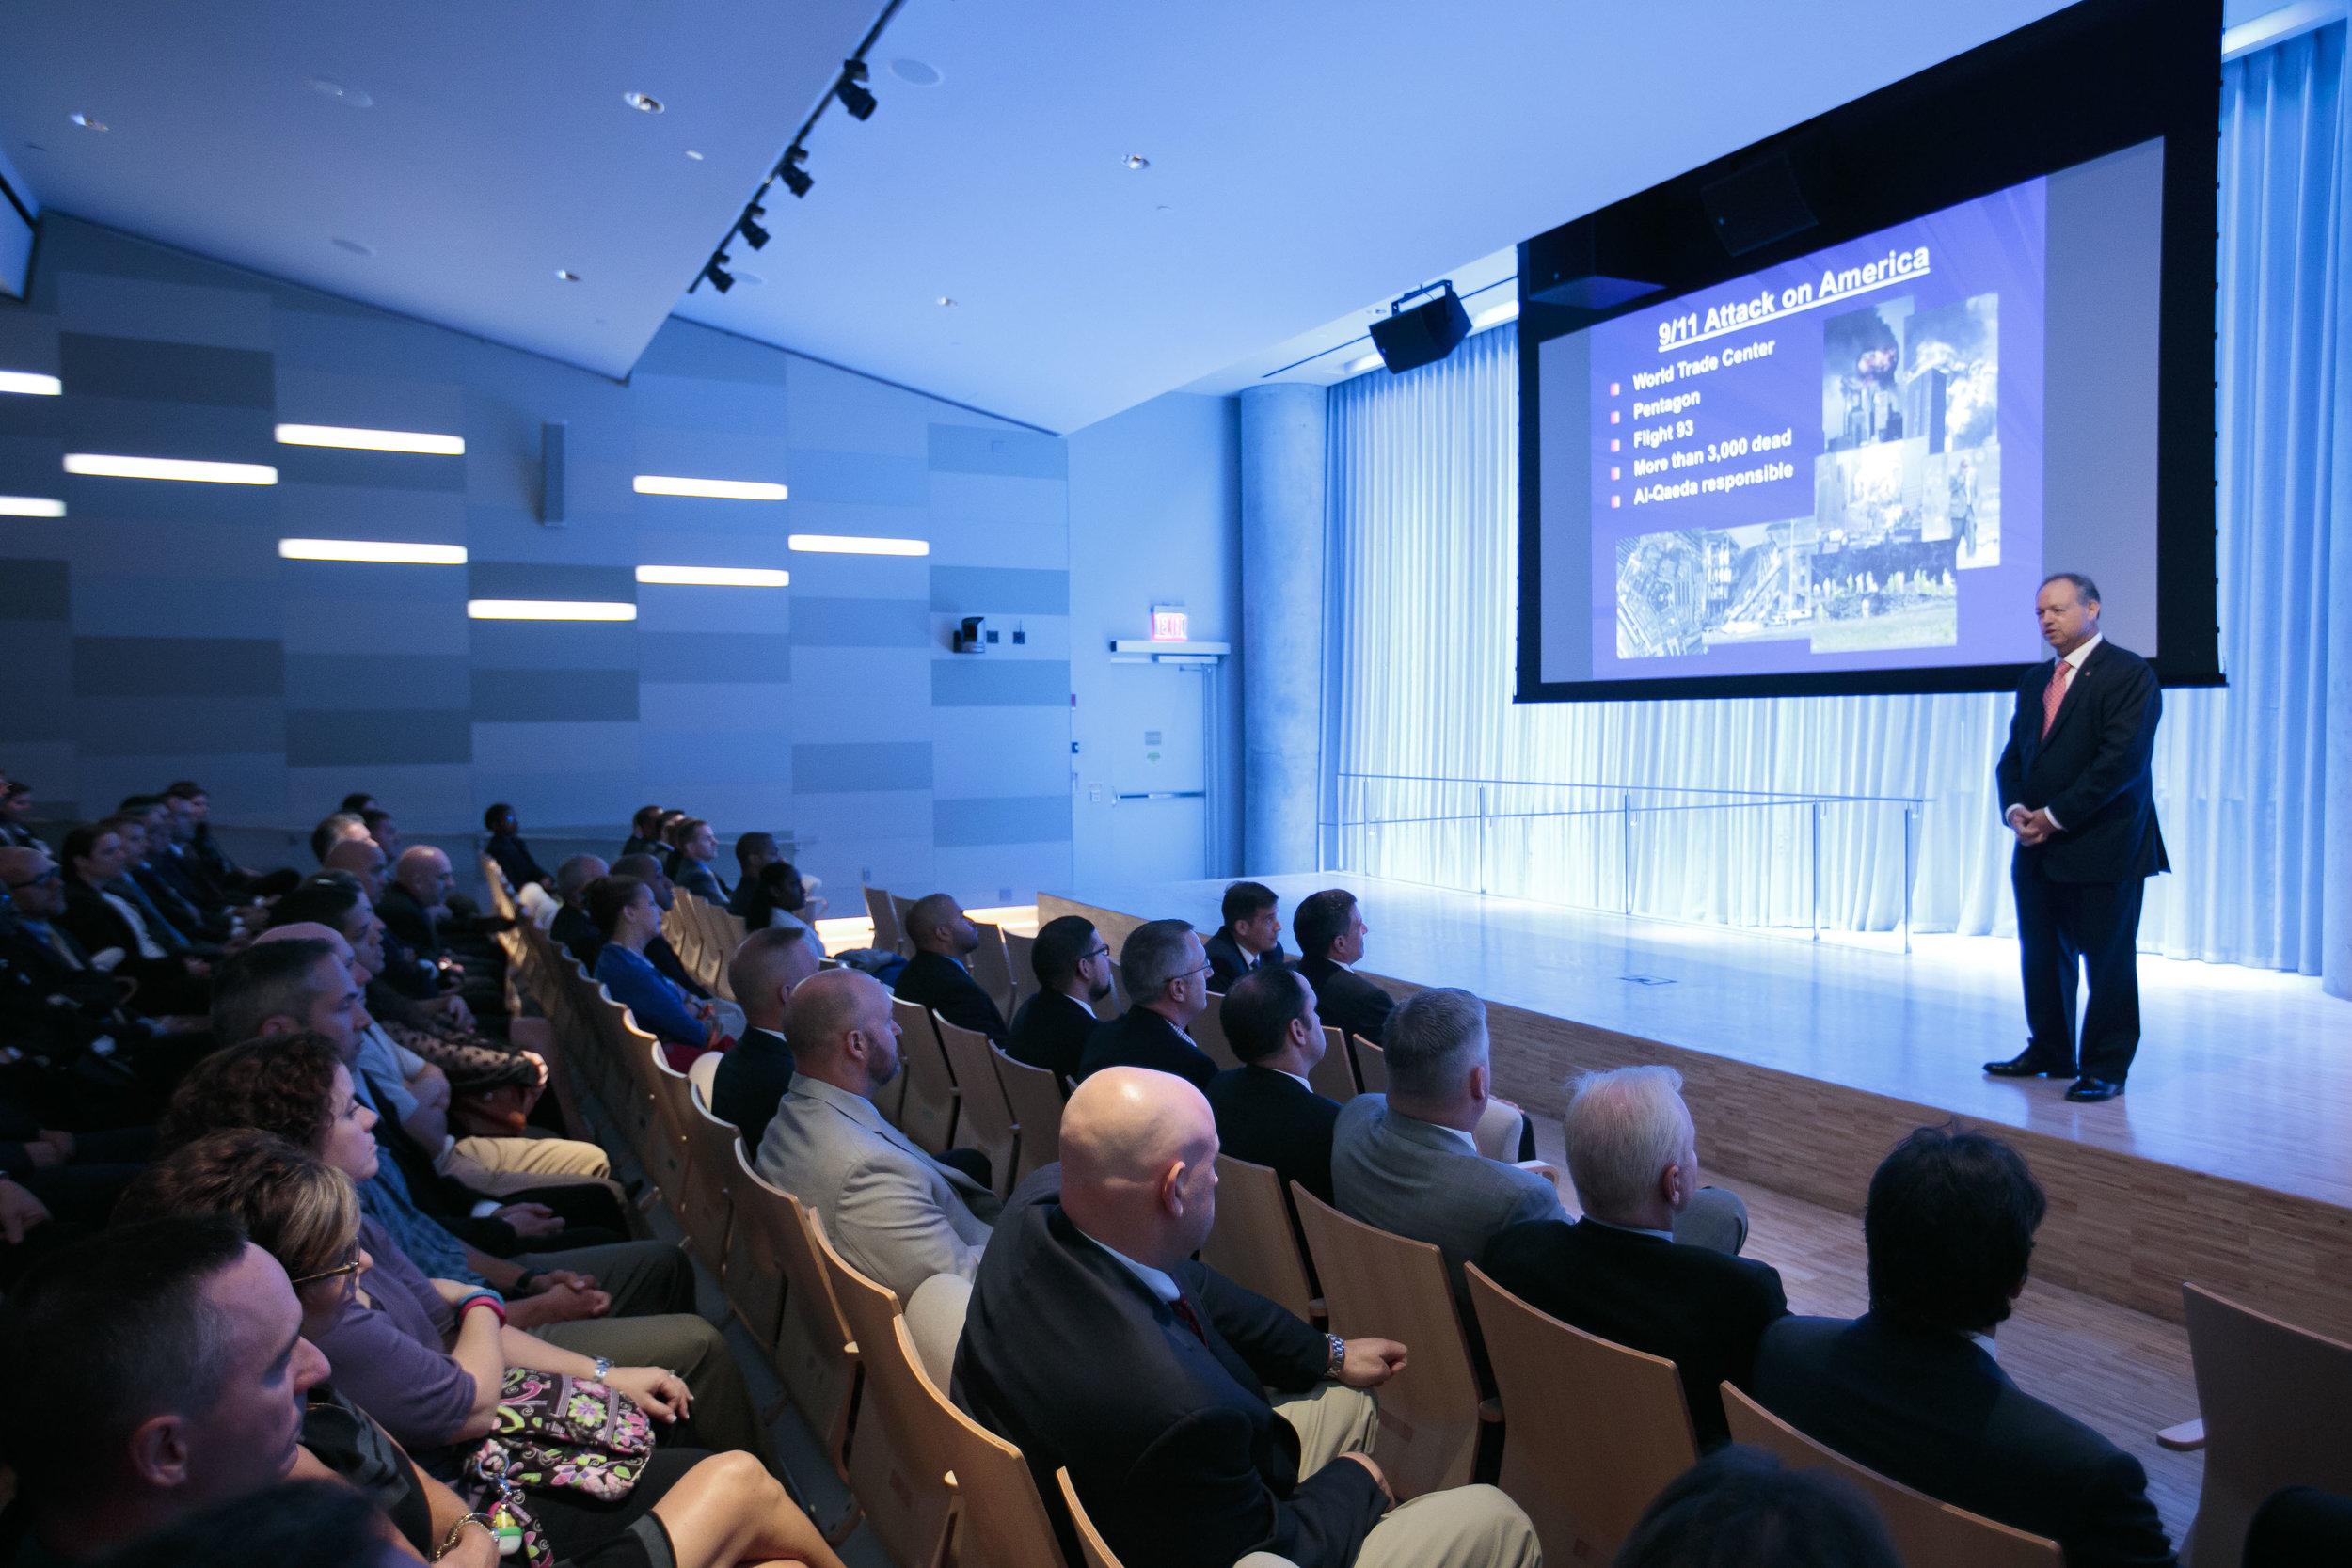 9/11 Memorial Speaker Series Conference